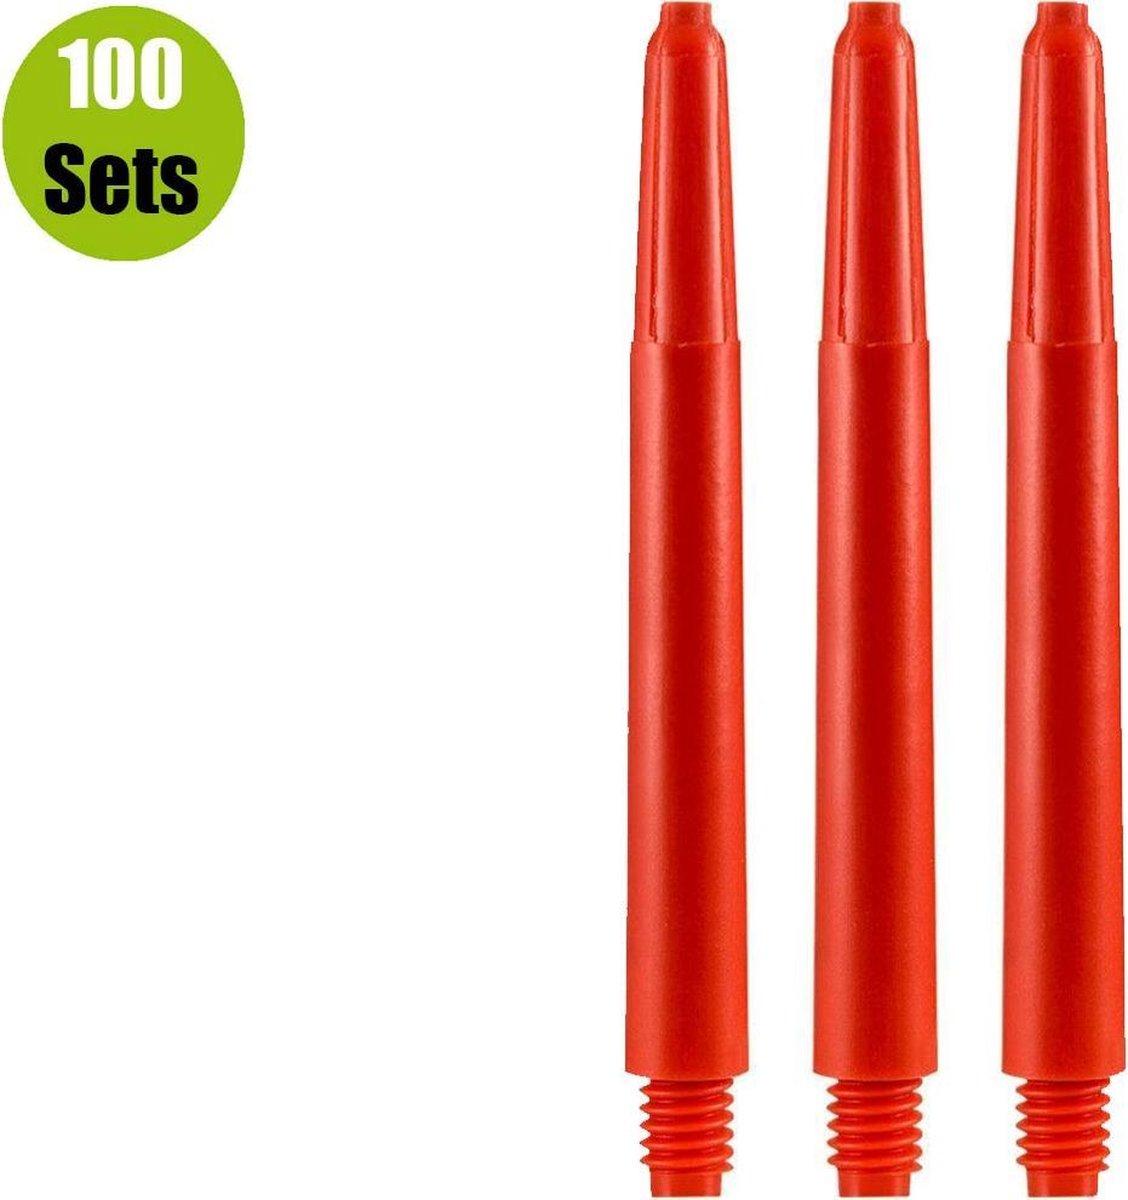 Nylon Dart Shafts - Rood - X-Short - (100 Sets)